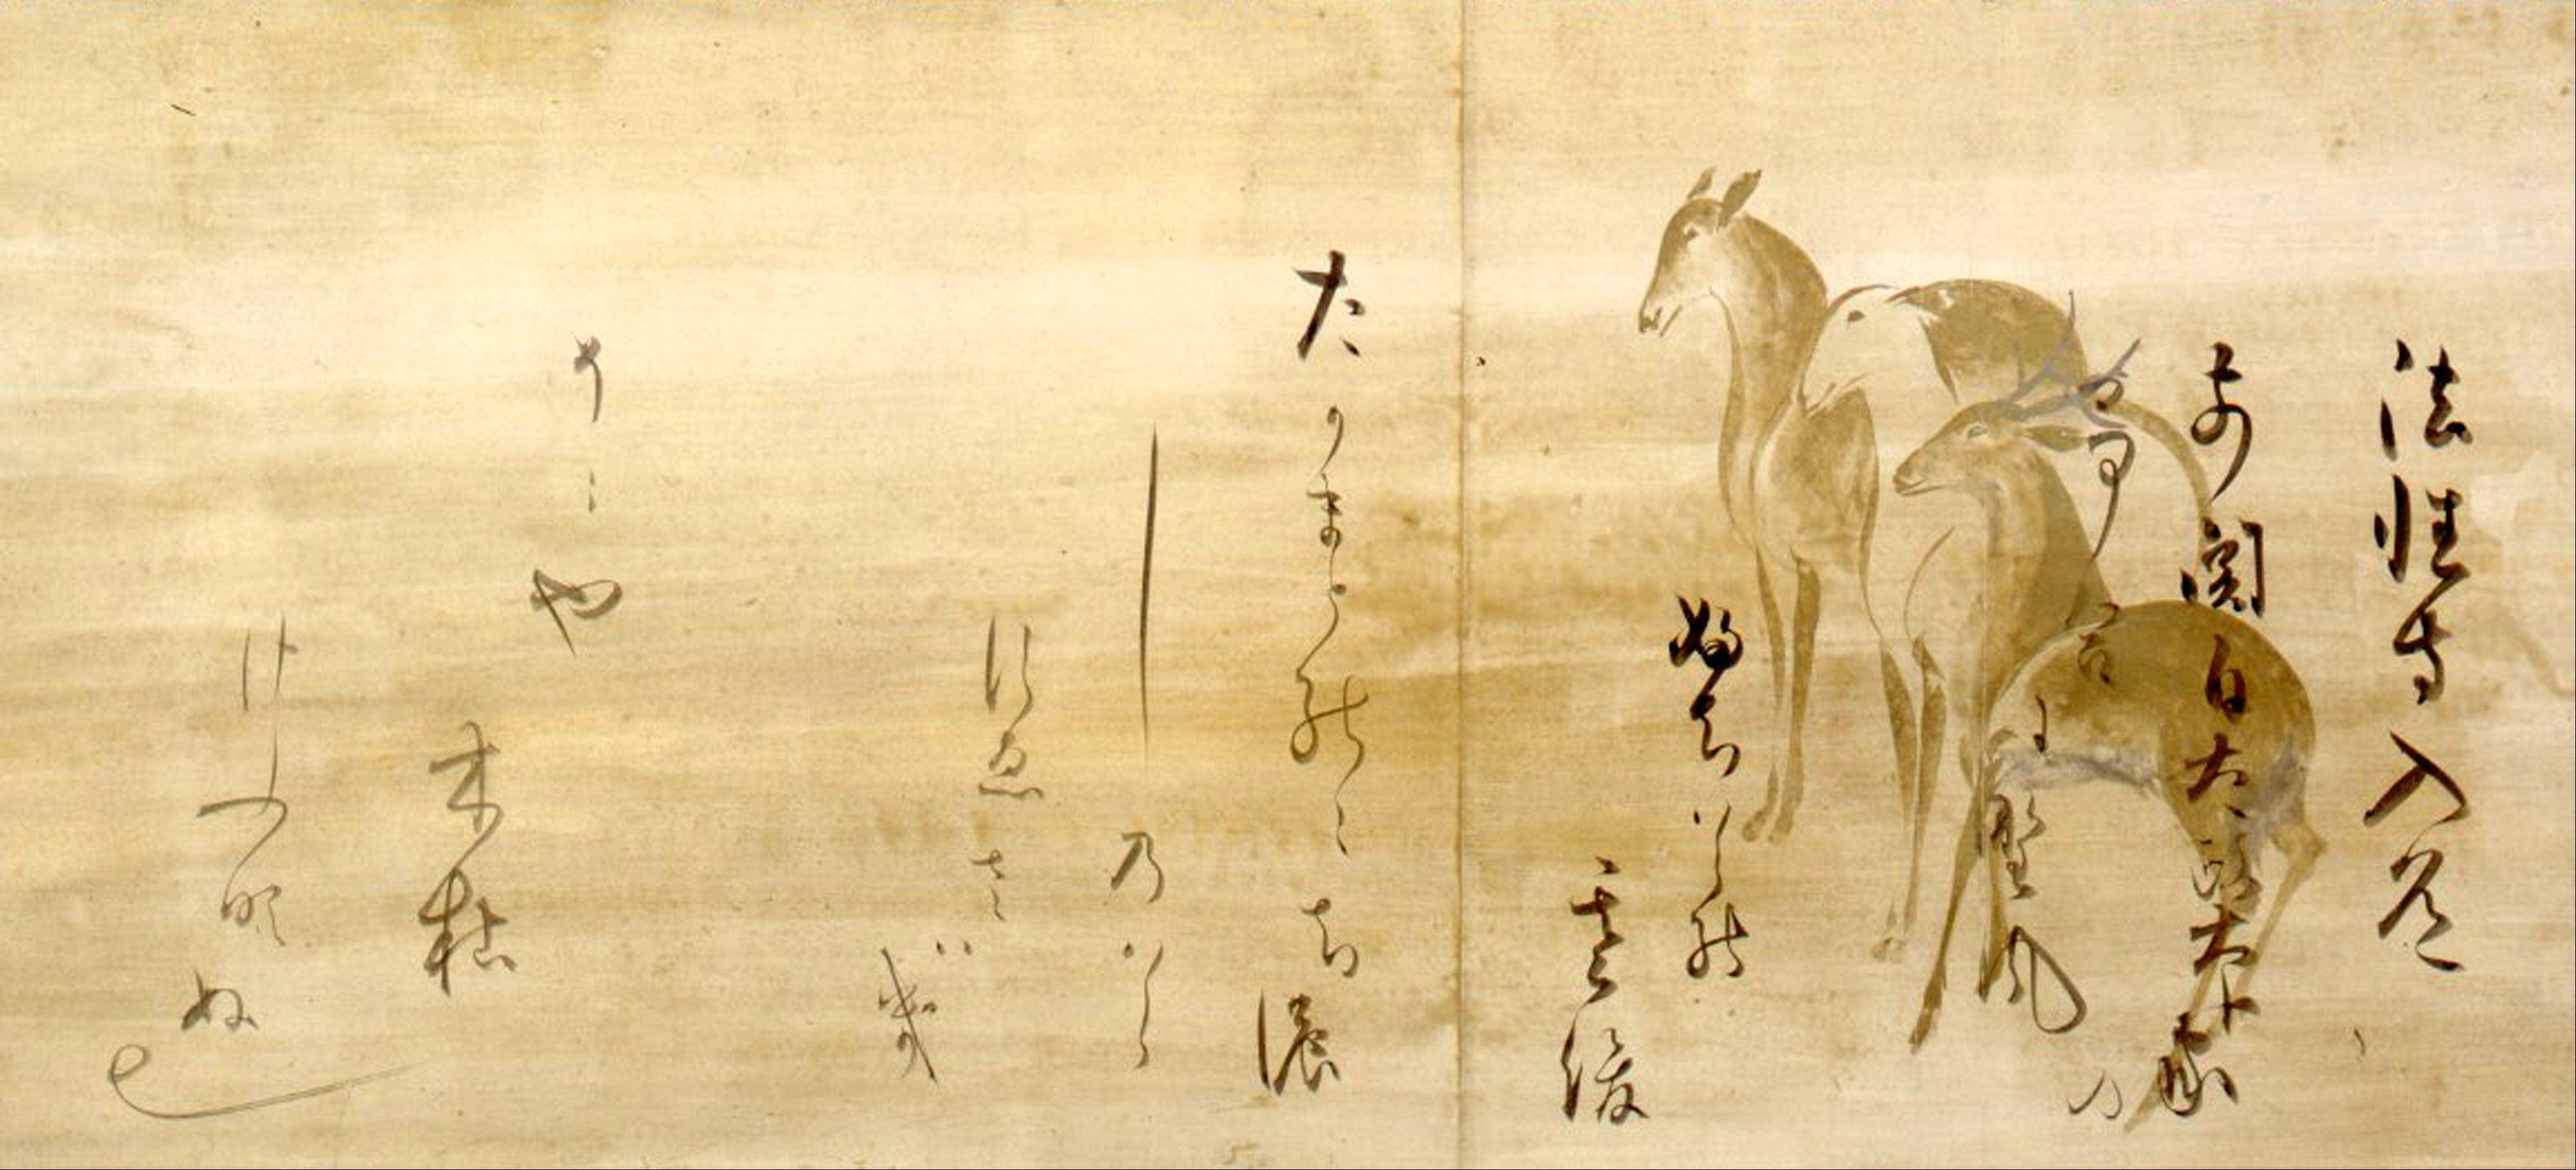 honami koetsu calligraphy of poems from the shinkokin honami koetsu 1558 1637 calligraphy of poems from the shinkokin wakashu on